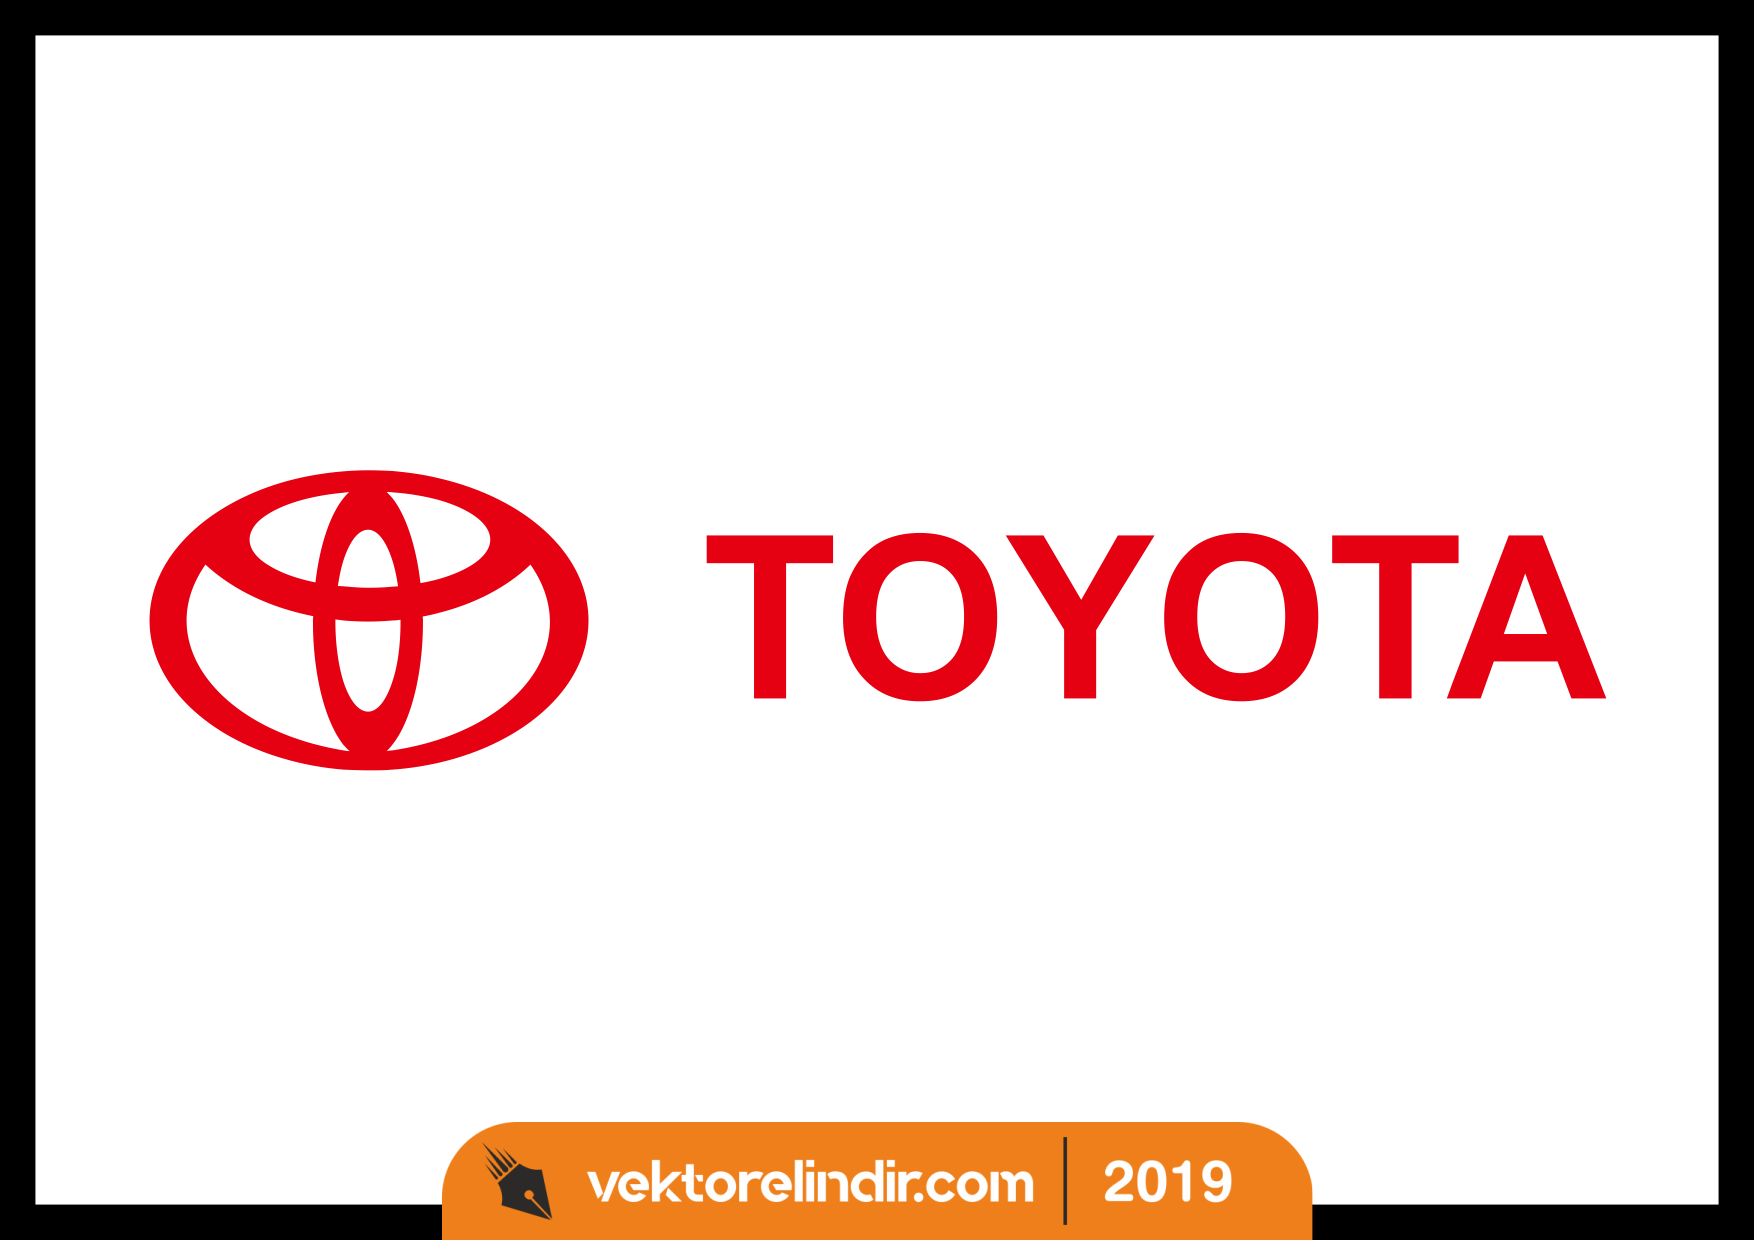 Toyata Logo